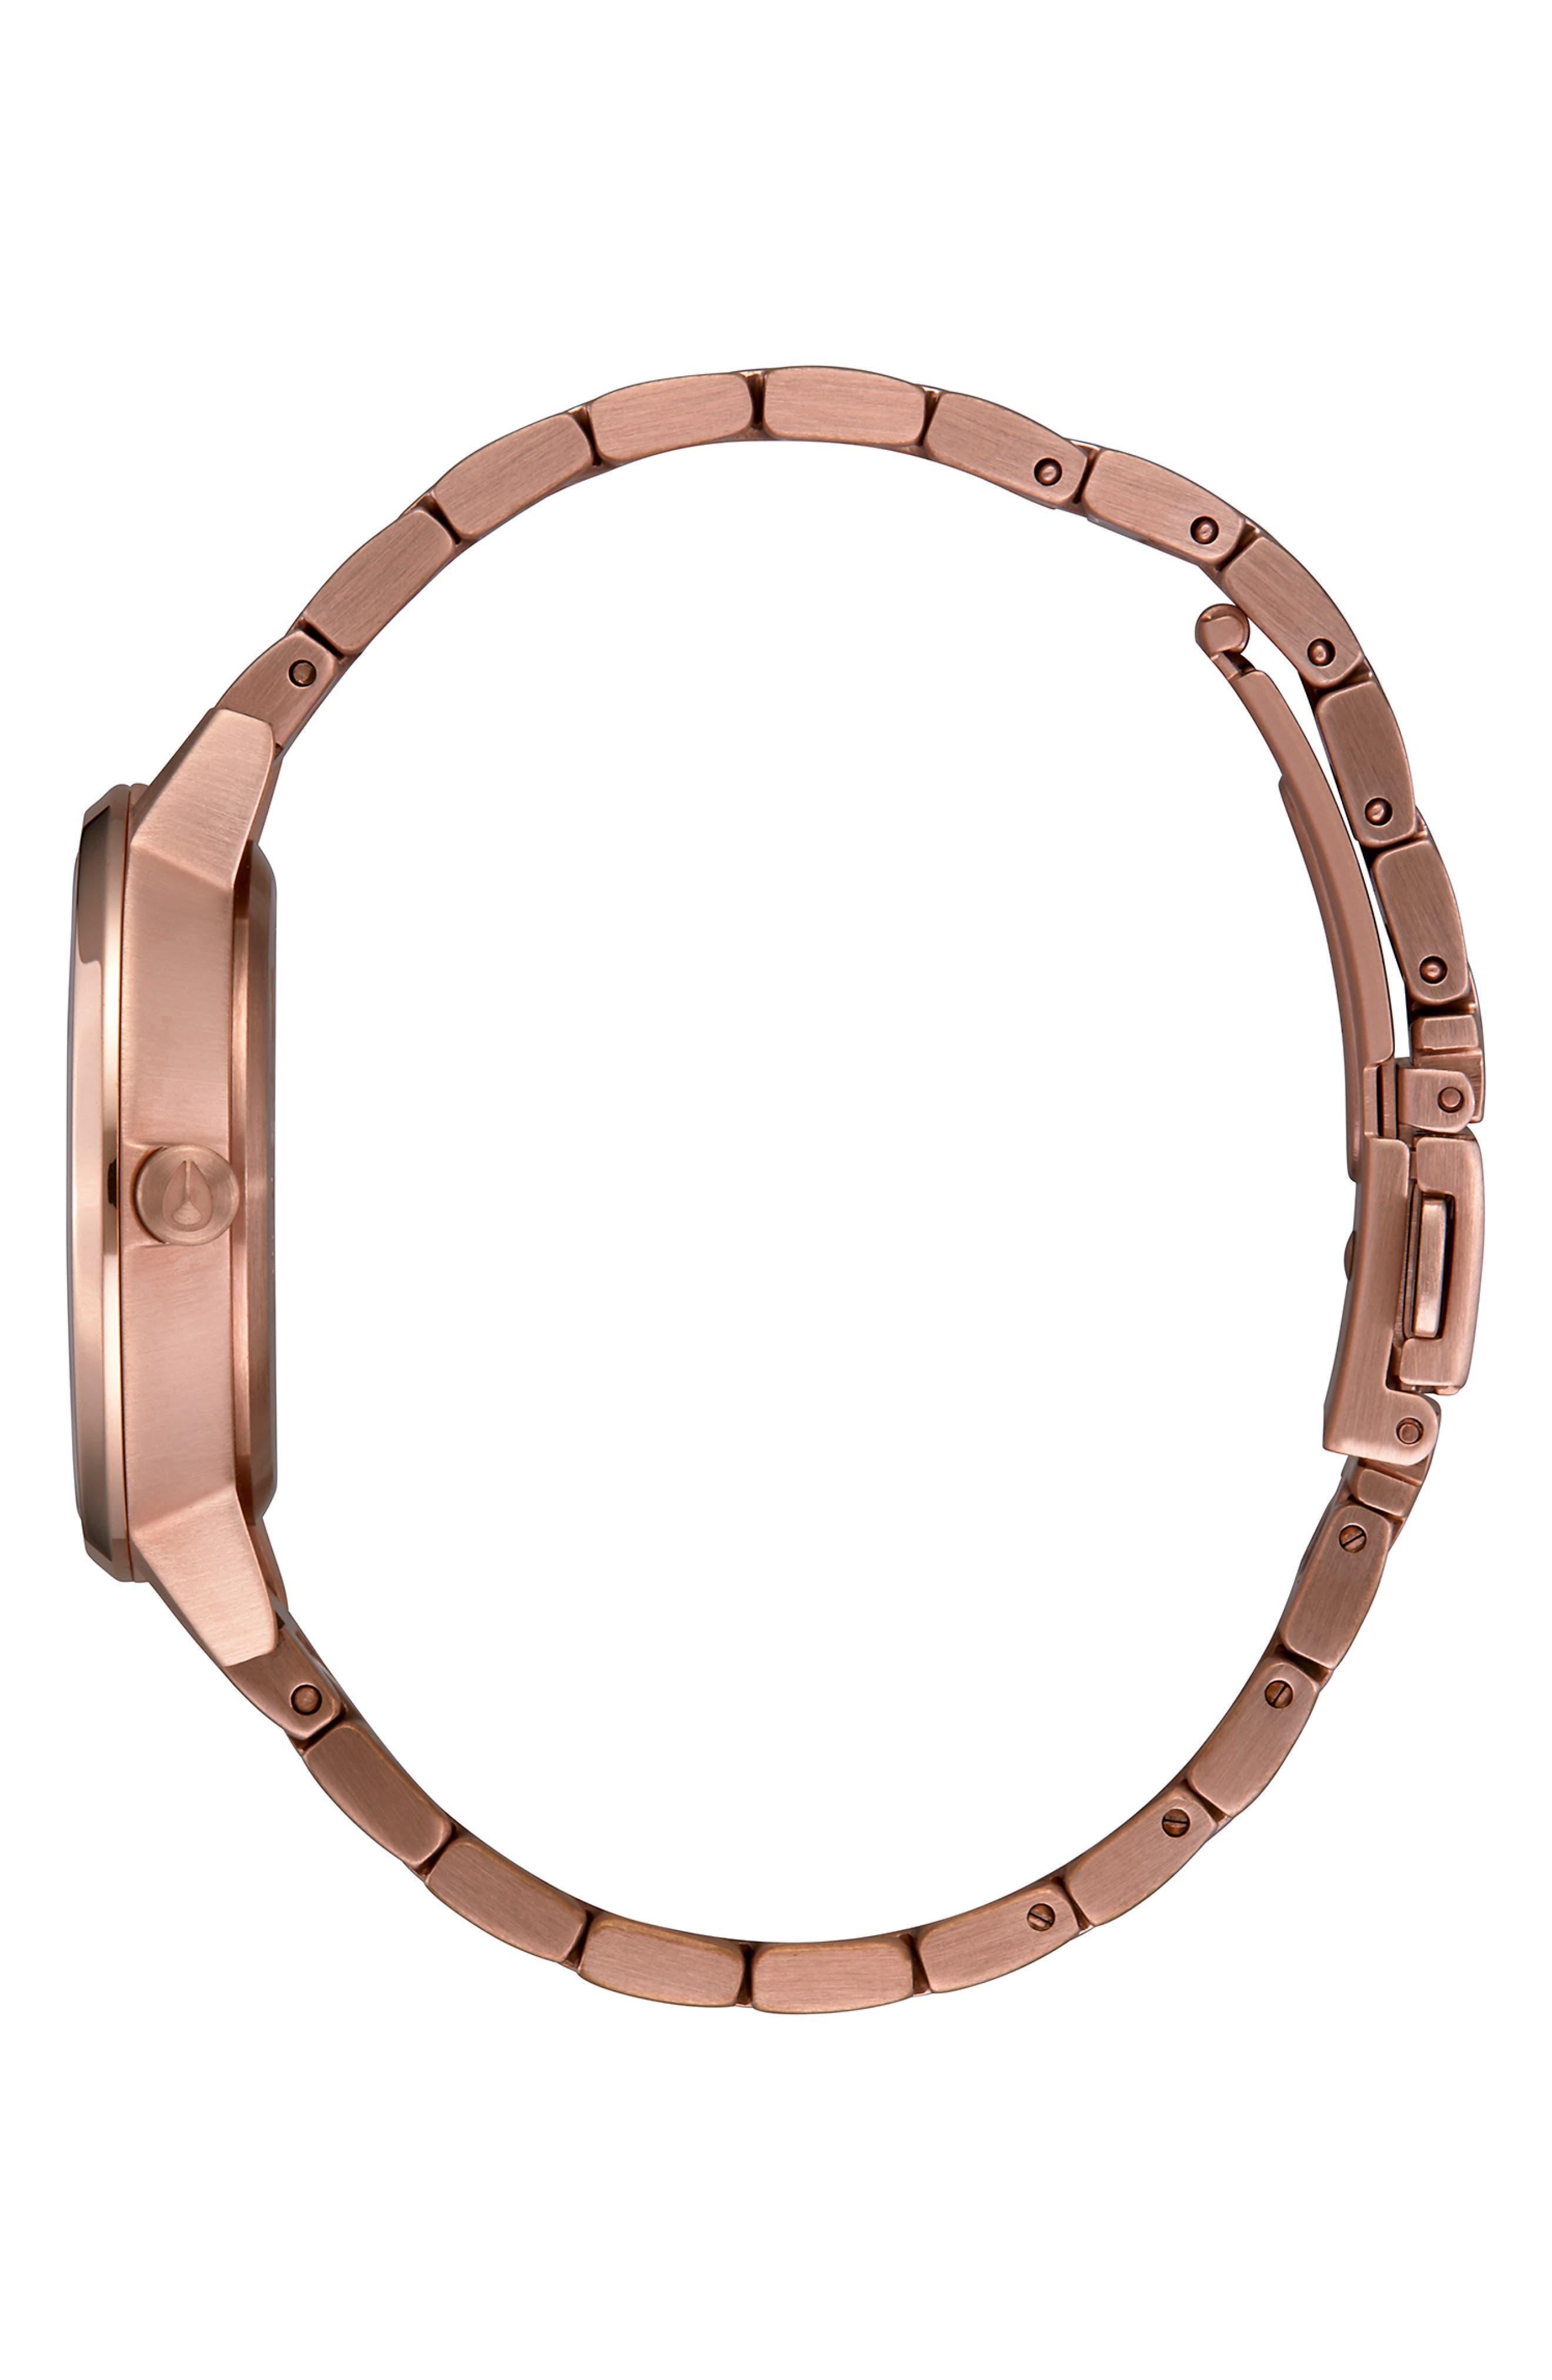 NIXON,                             Medium Kensington Bracelet Watch, 32mm,                             Alternate thumbnail 3, color,                             ROSE GOLD